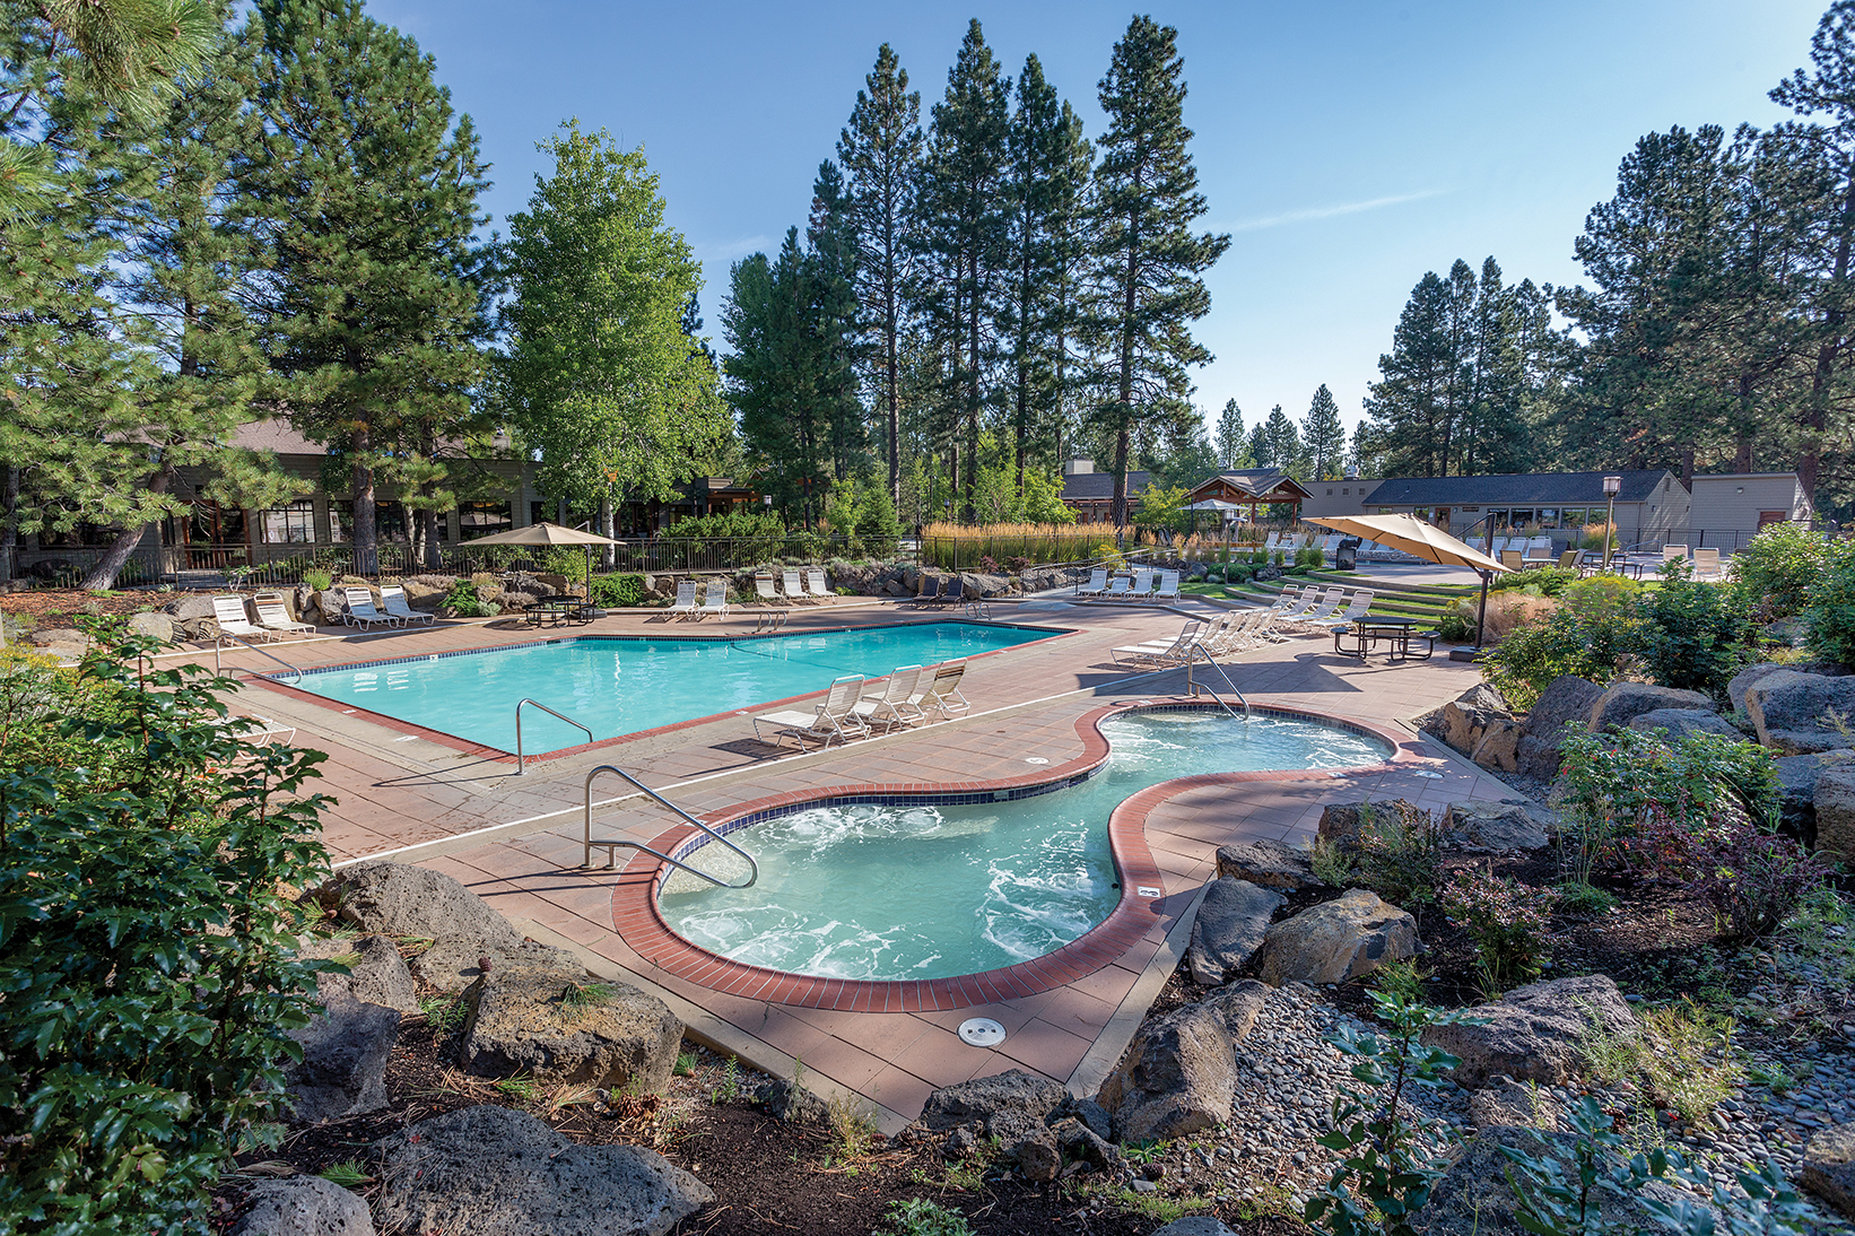 seventh mountain resort | worldmark bend - seventh mountain resort